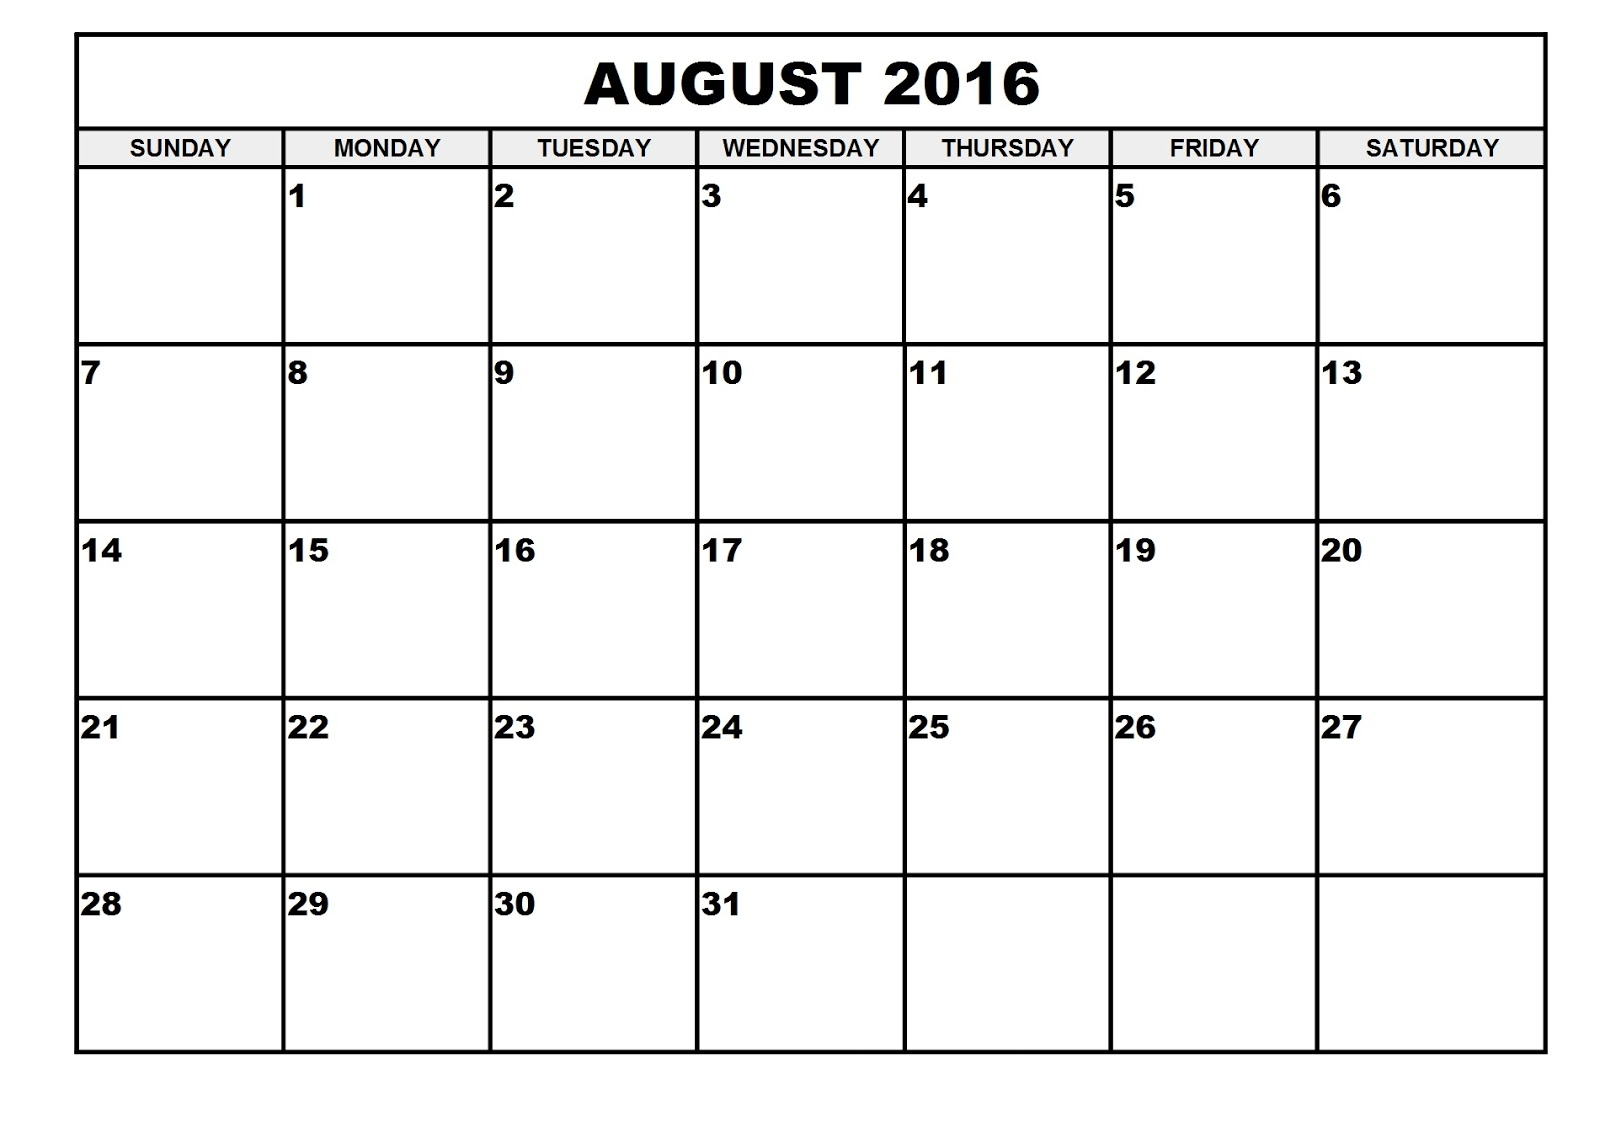 2016 Monthly Blank Calendar: August 2016 Printable Calendar Template